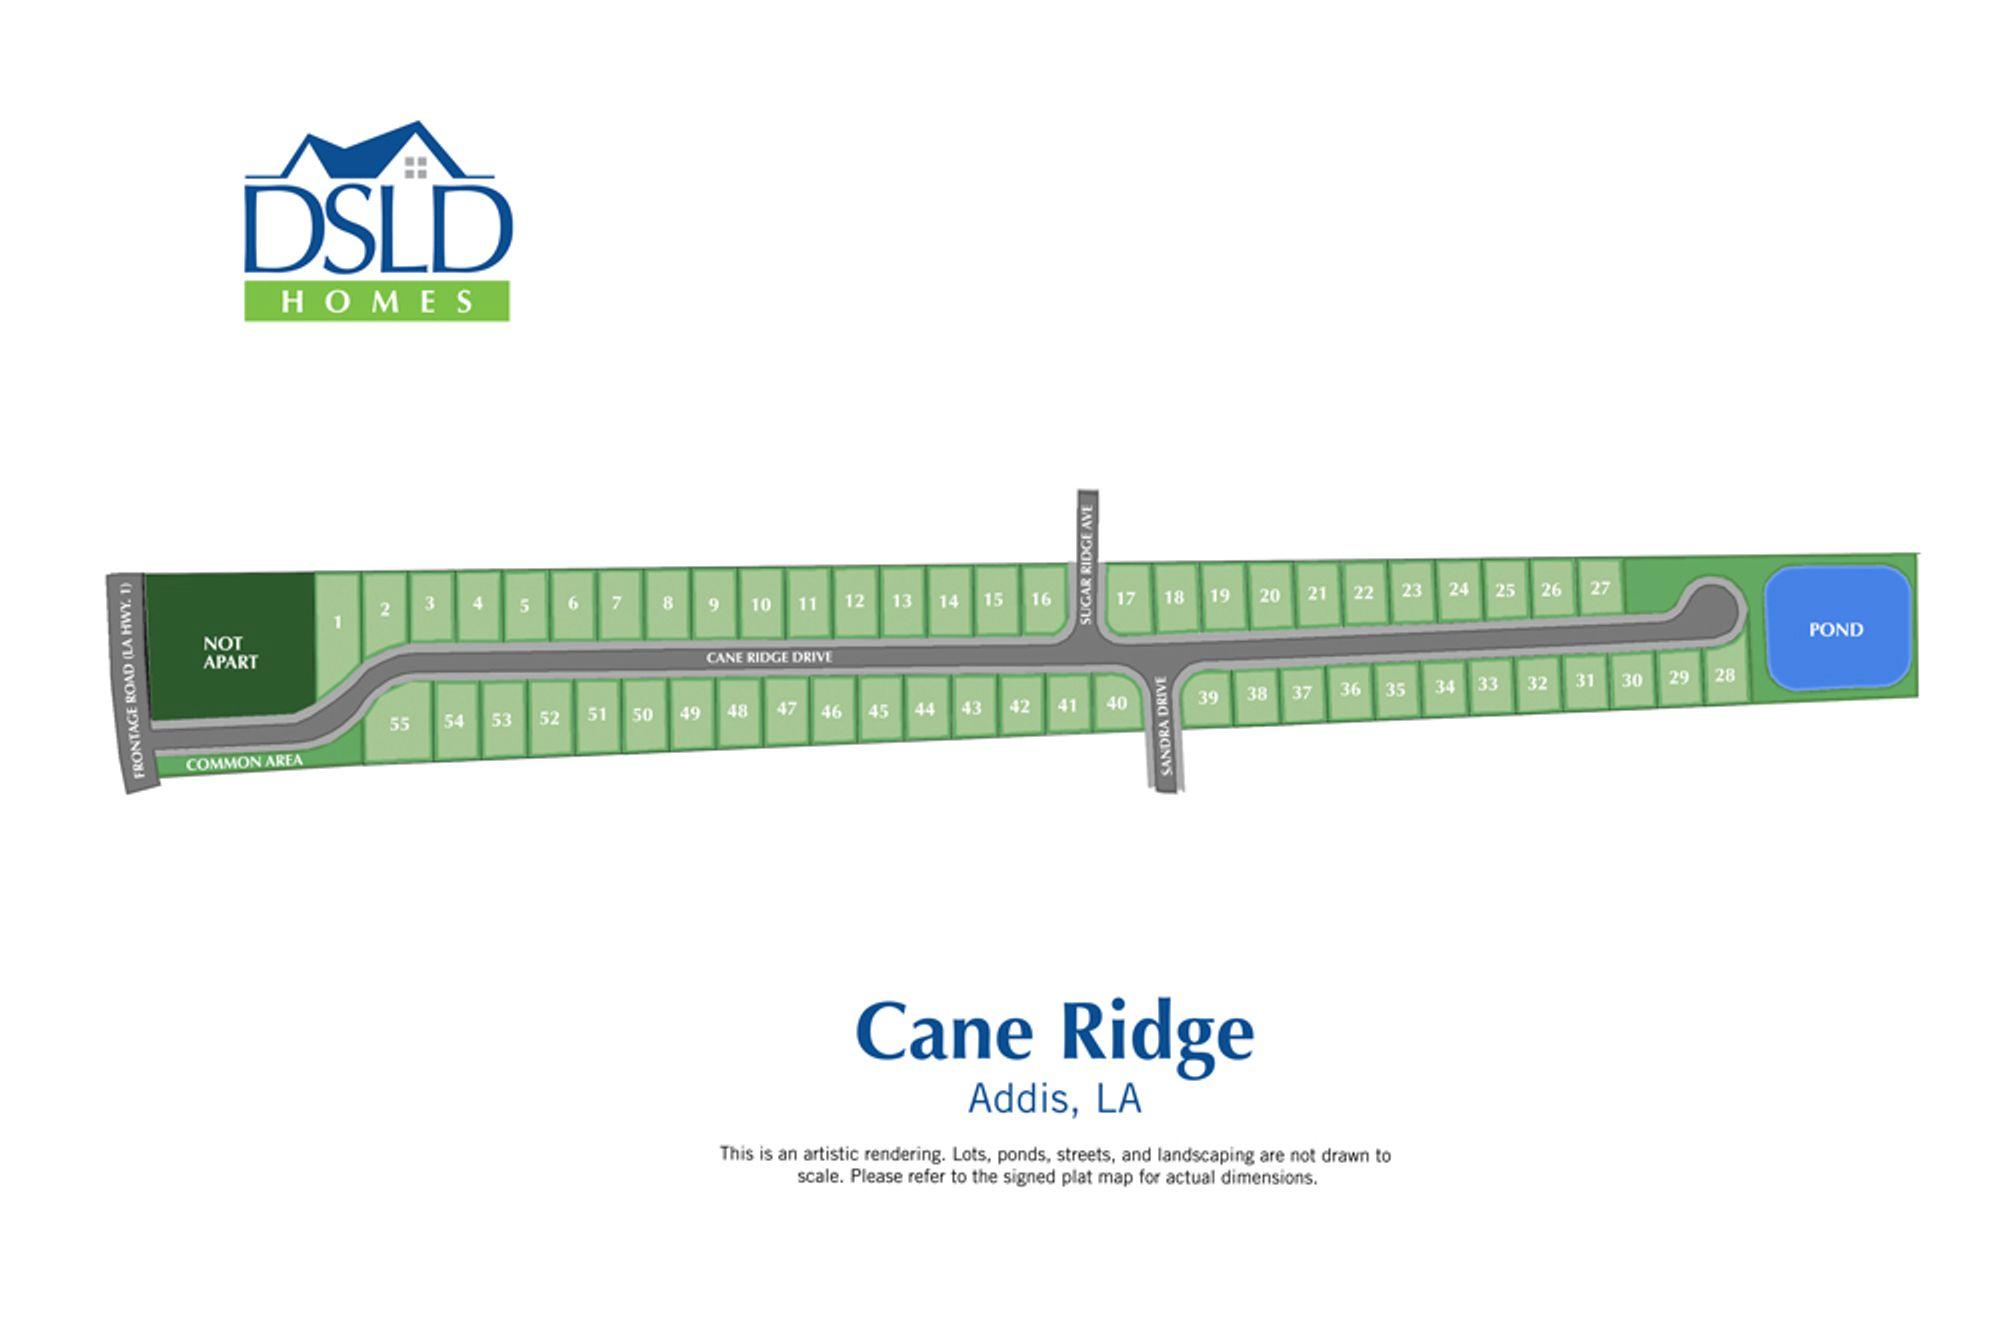 Cane Ridge